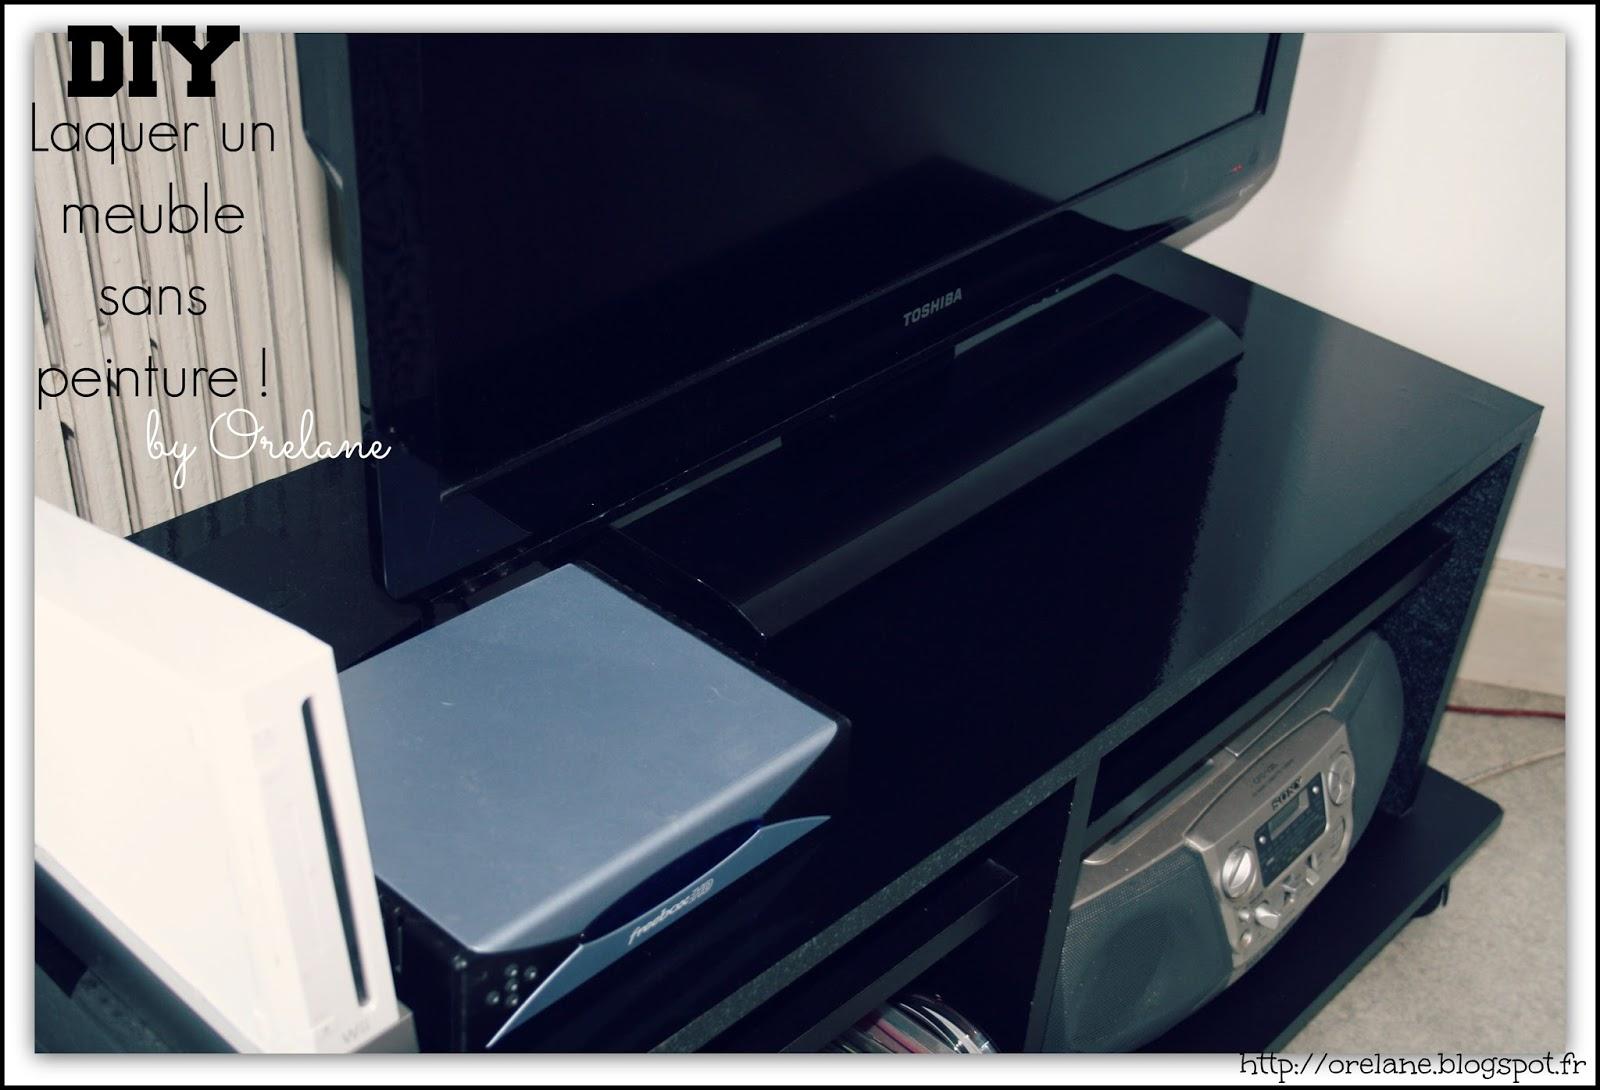 orelane diy laquer un meuble sans peinture. Black Bedroom Furniture Sets. Home Design Ideas